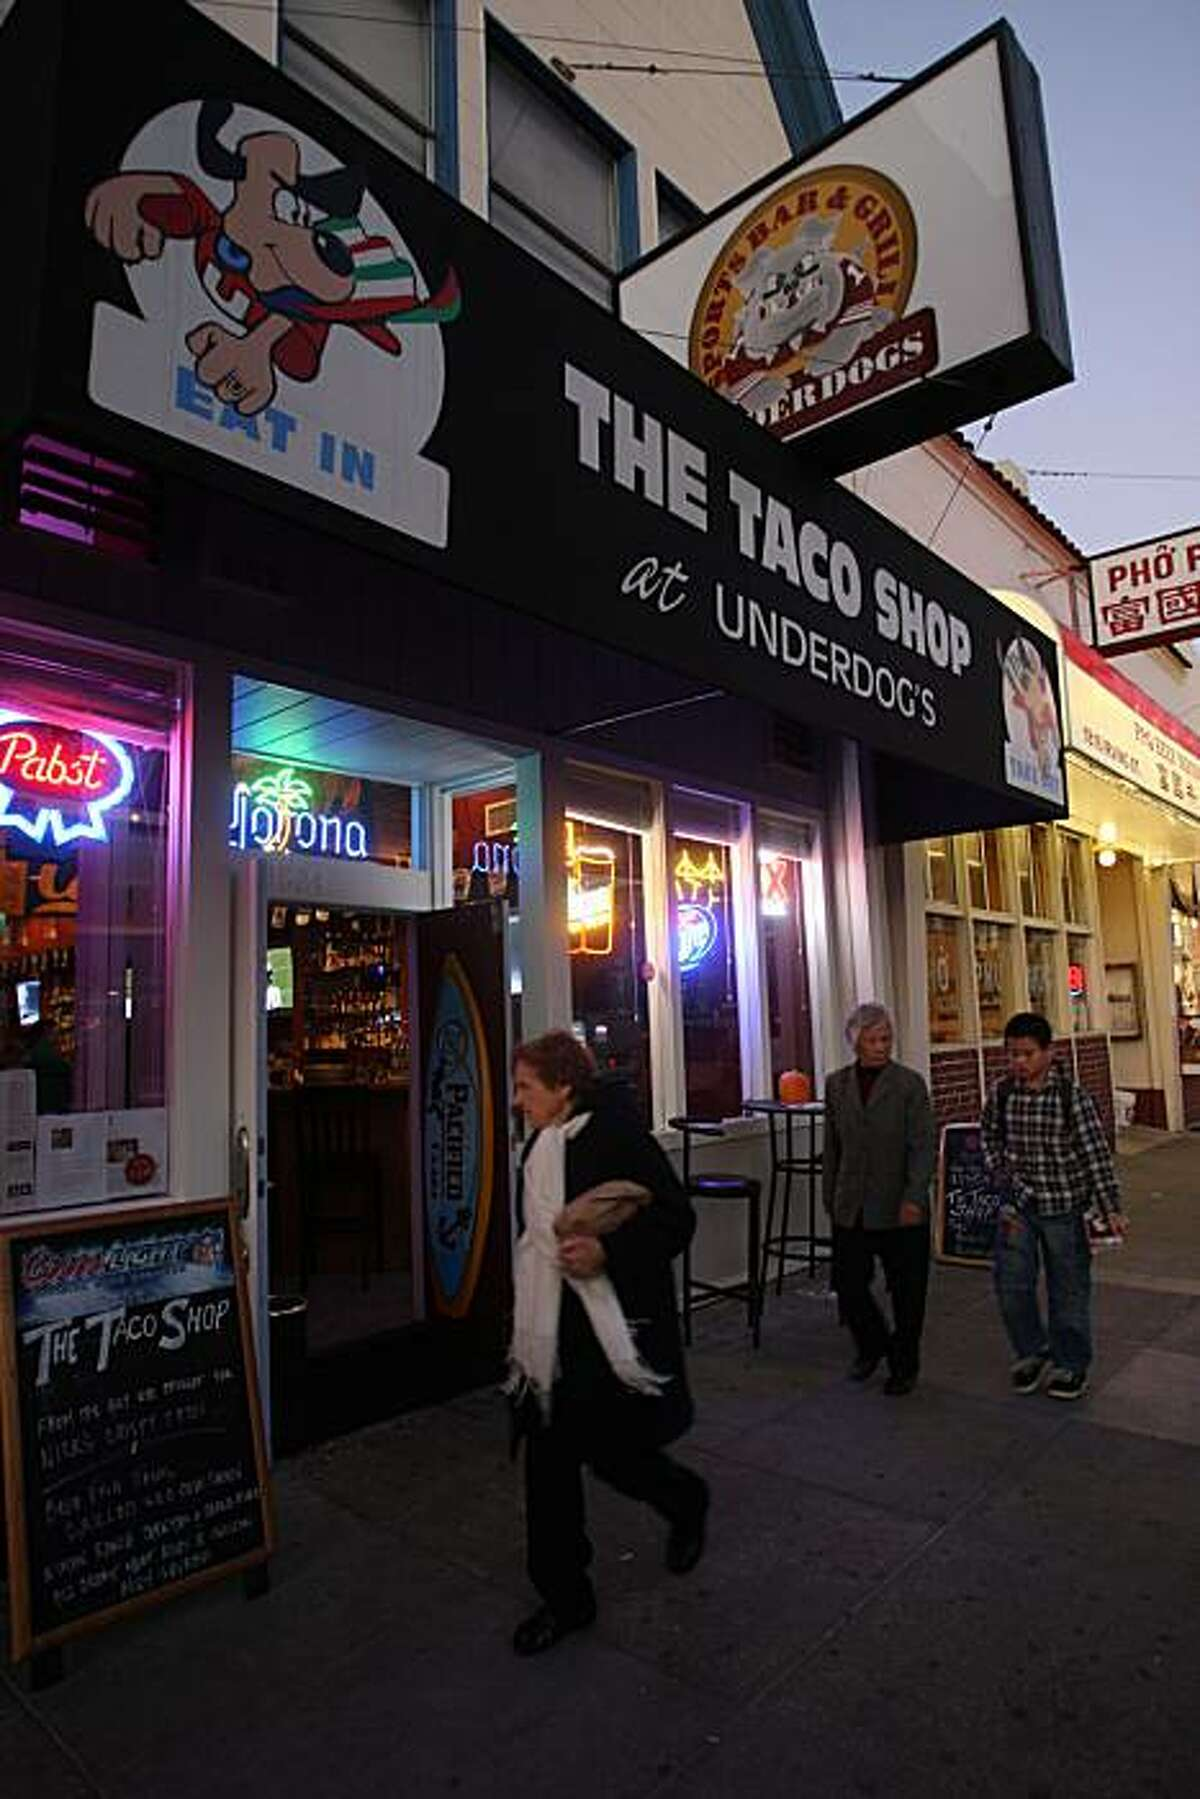 Underdogs Sports Bar & Grill in San Francisco, CA., on Thursday, November 6, 2008.